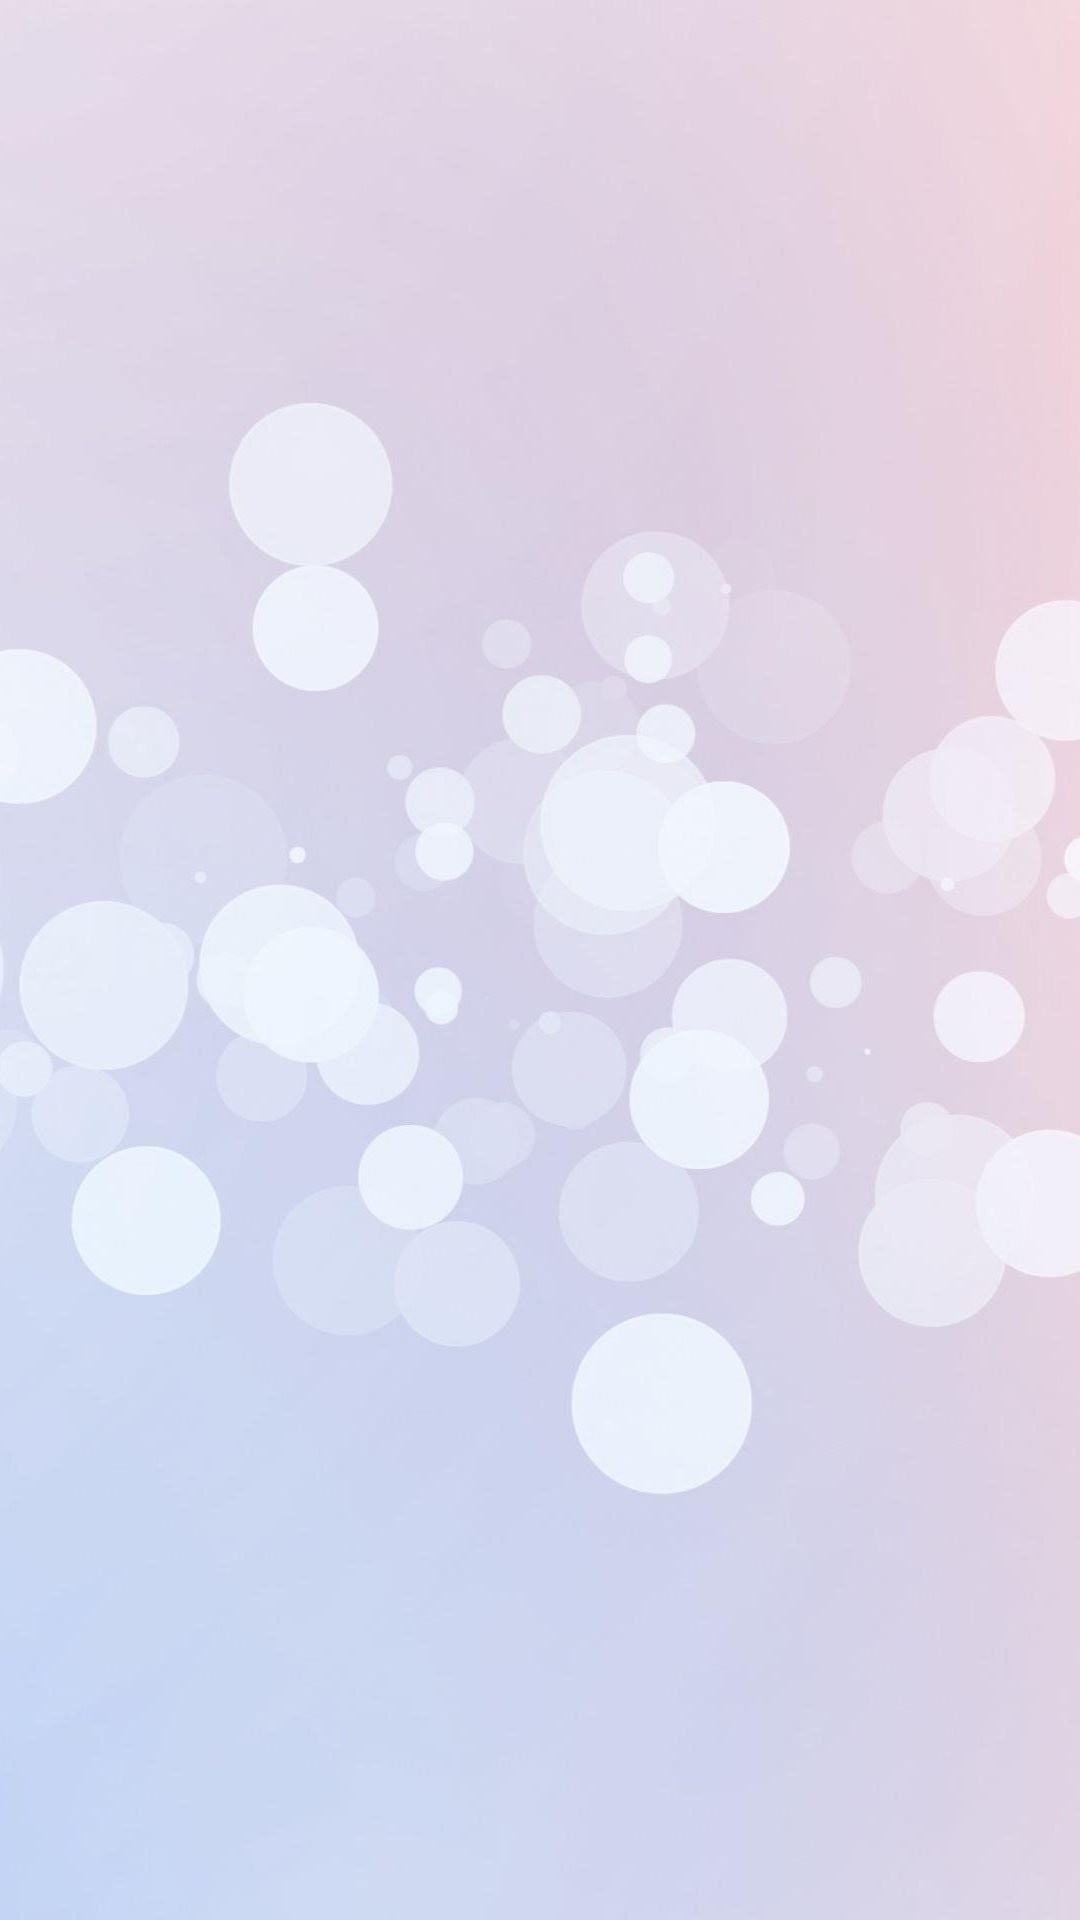 Girly iPhone Wallpaper Free HD